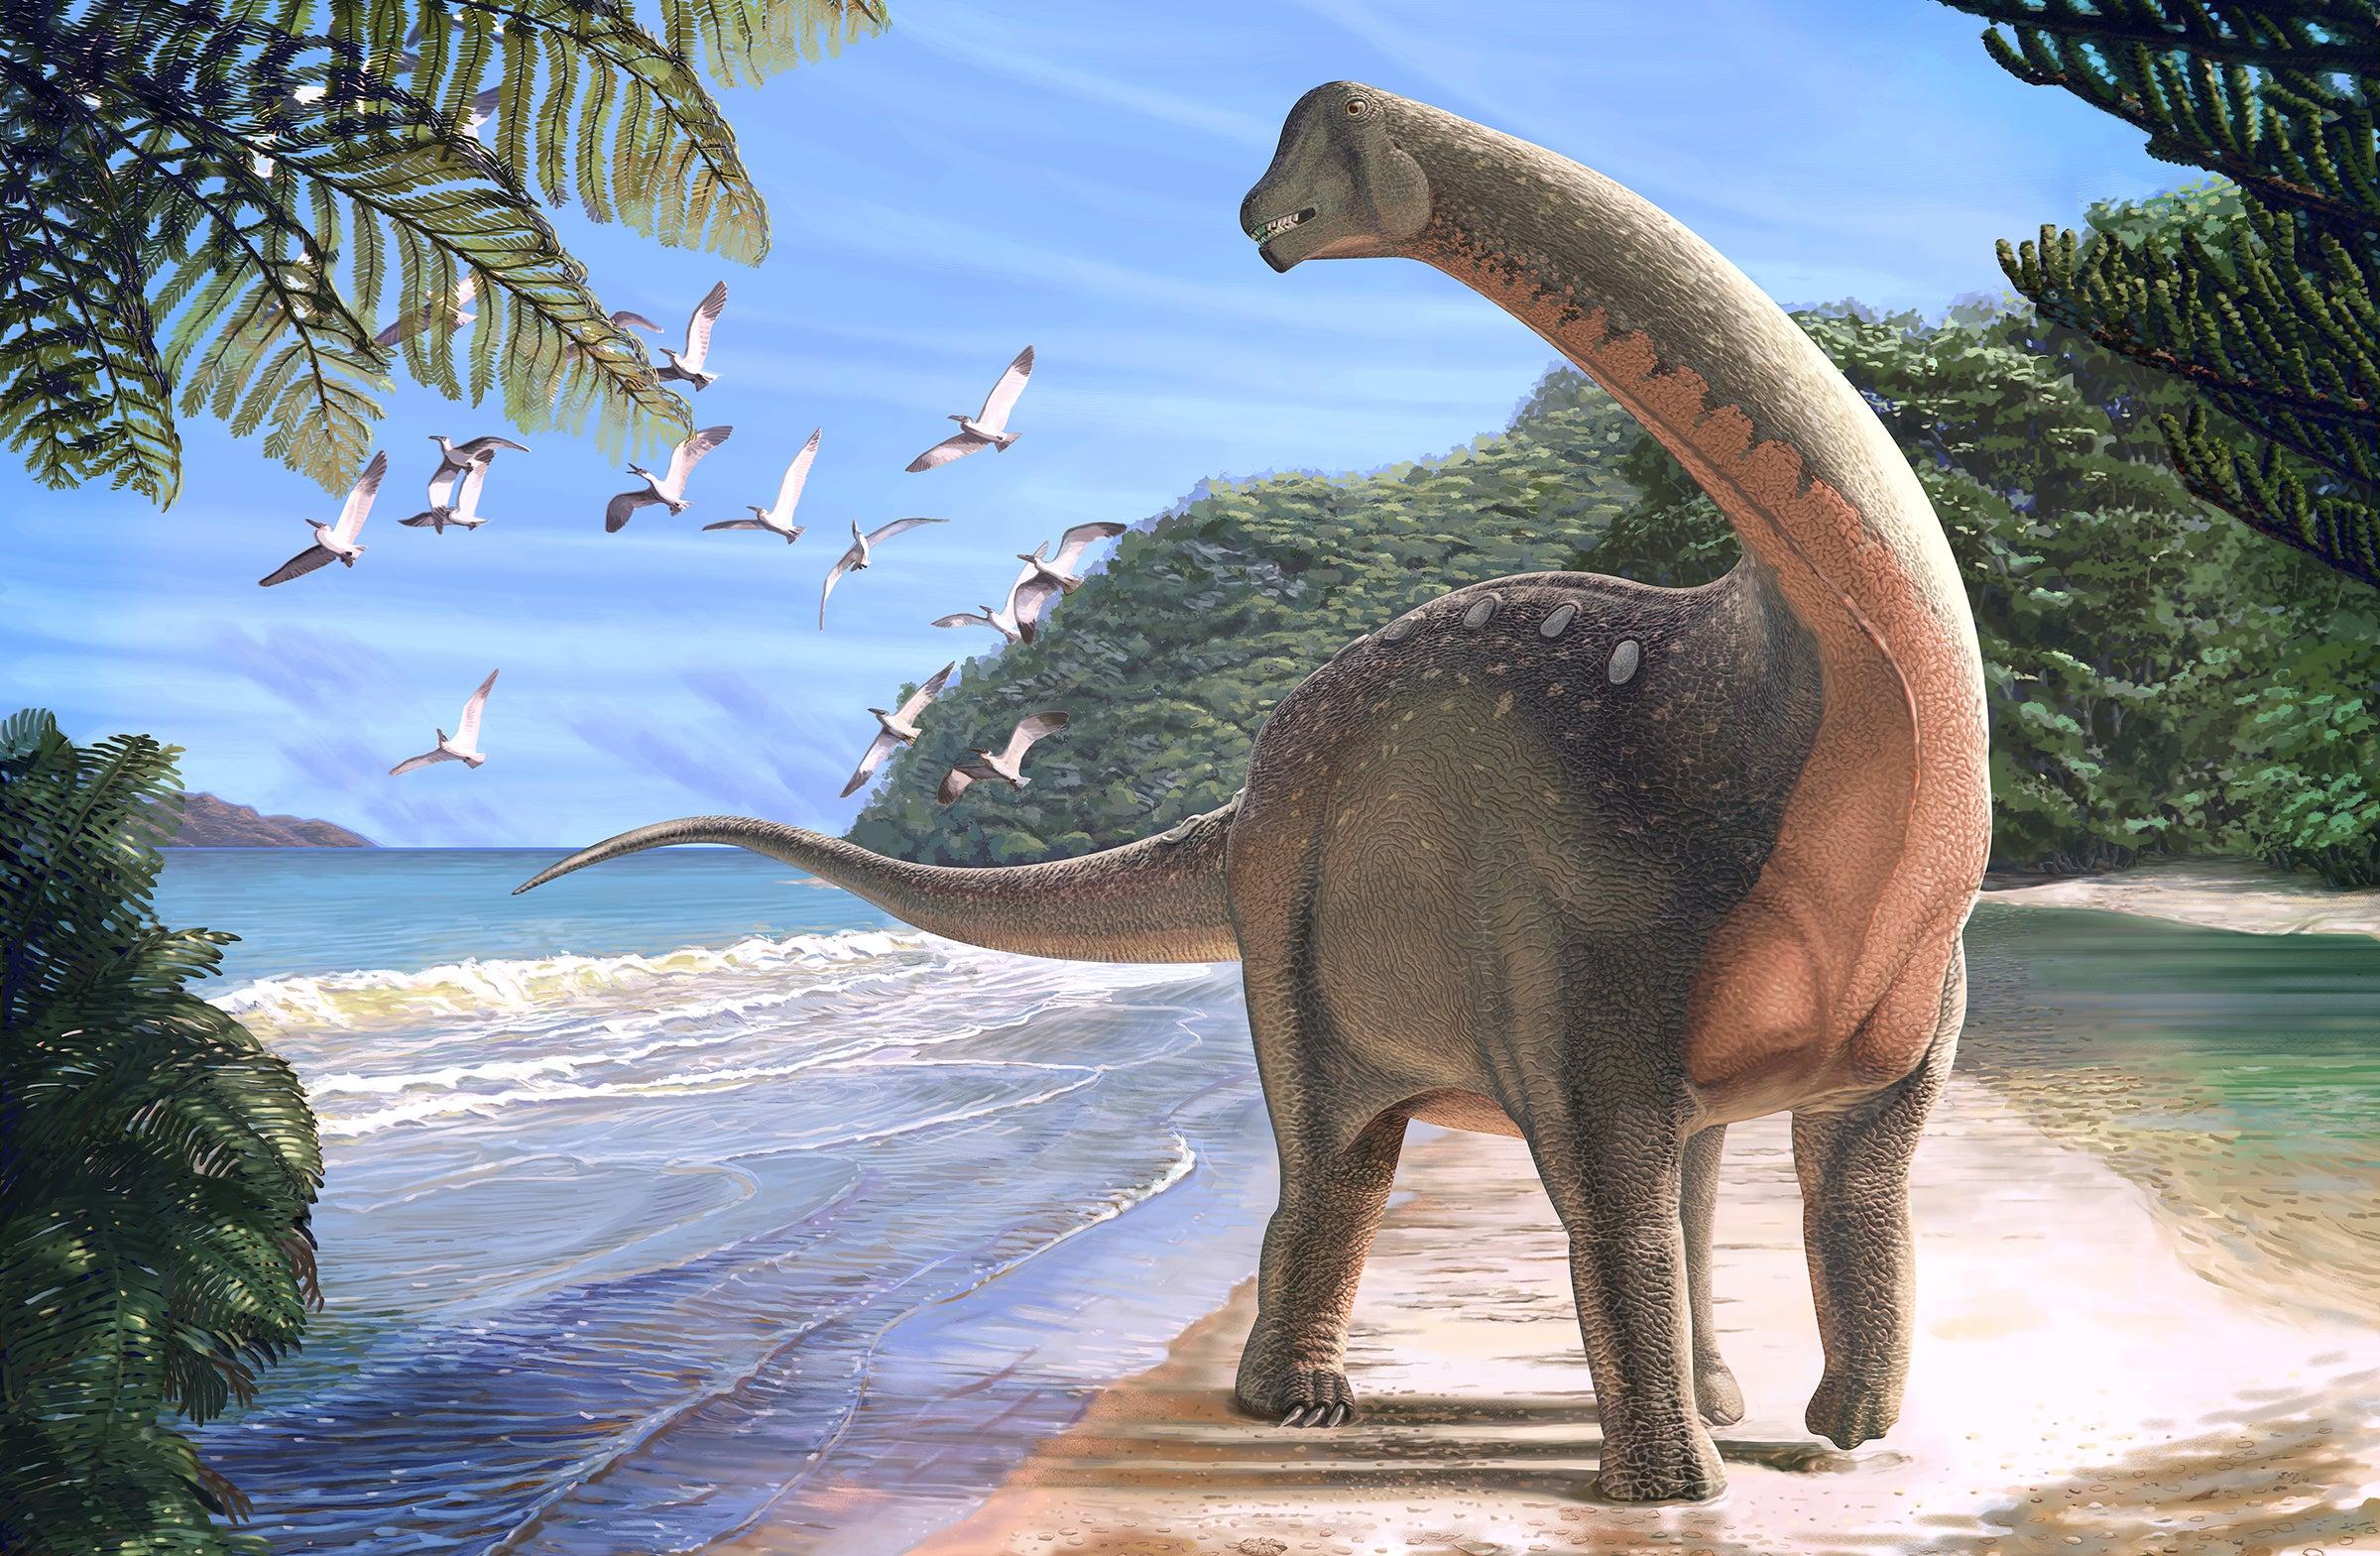 New Species Of African Titanosaur Solves Cretaceous-Era Mystery